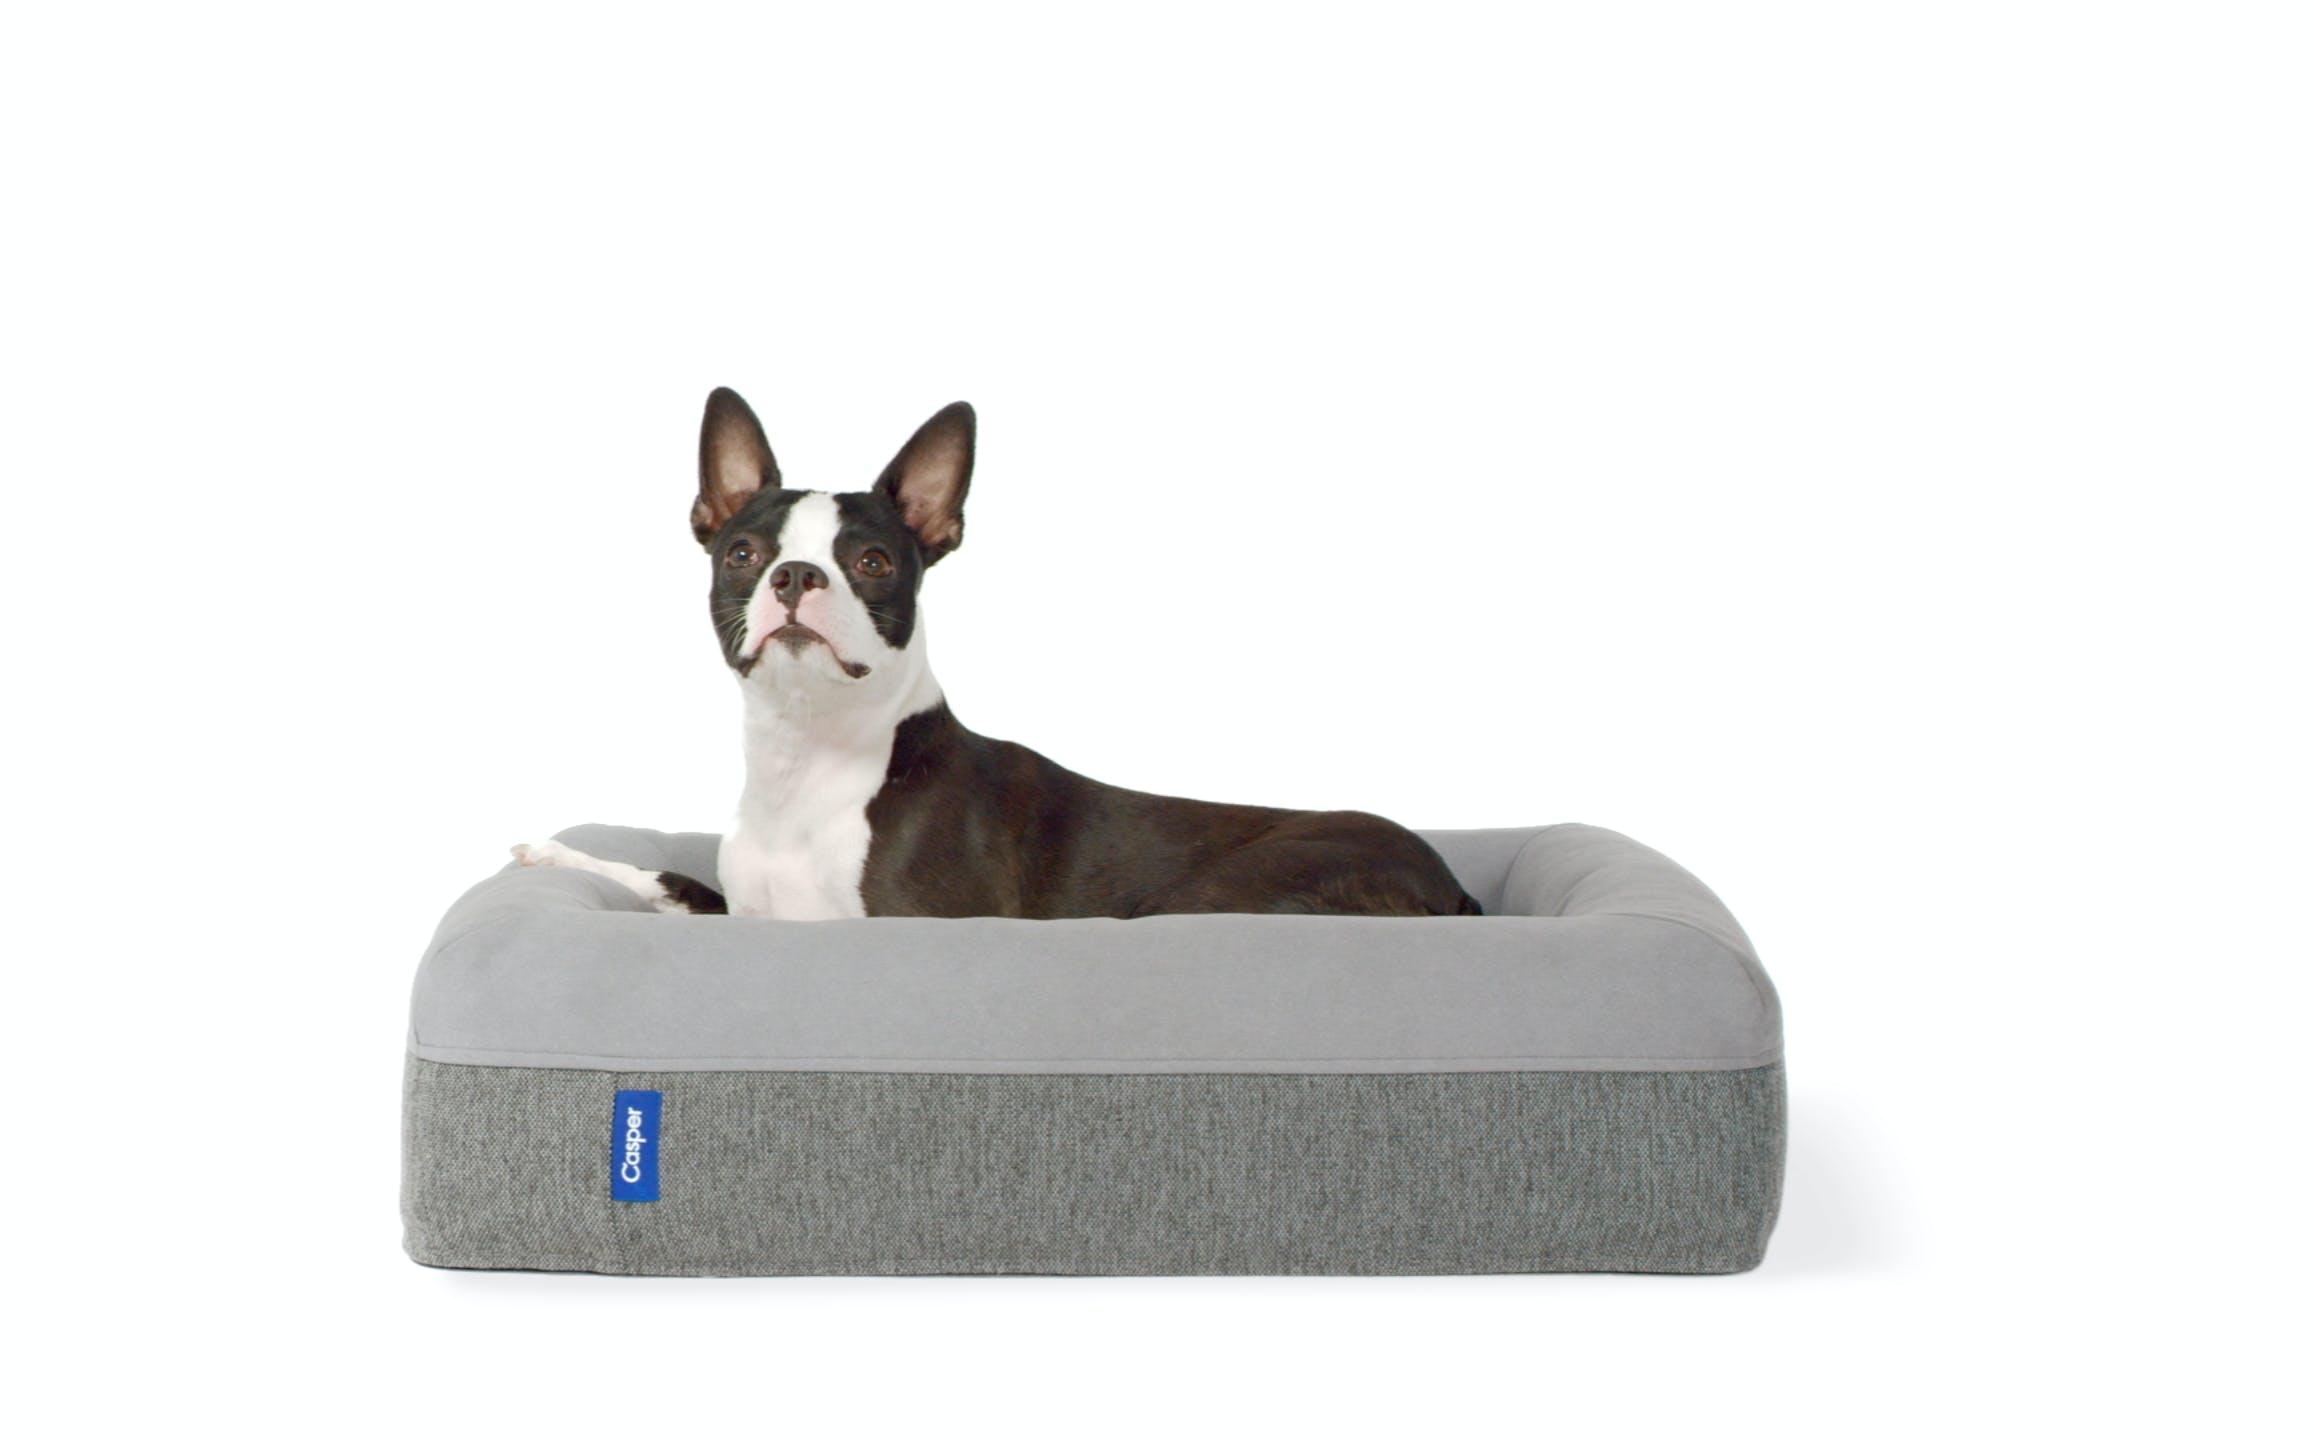 Dog Bed Small Medium or